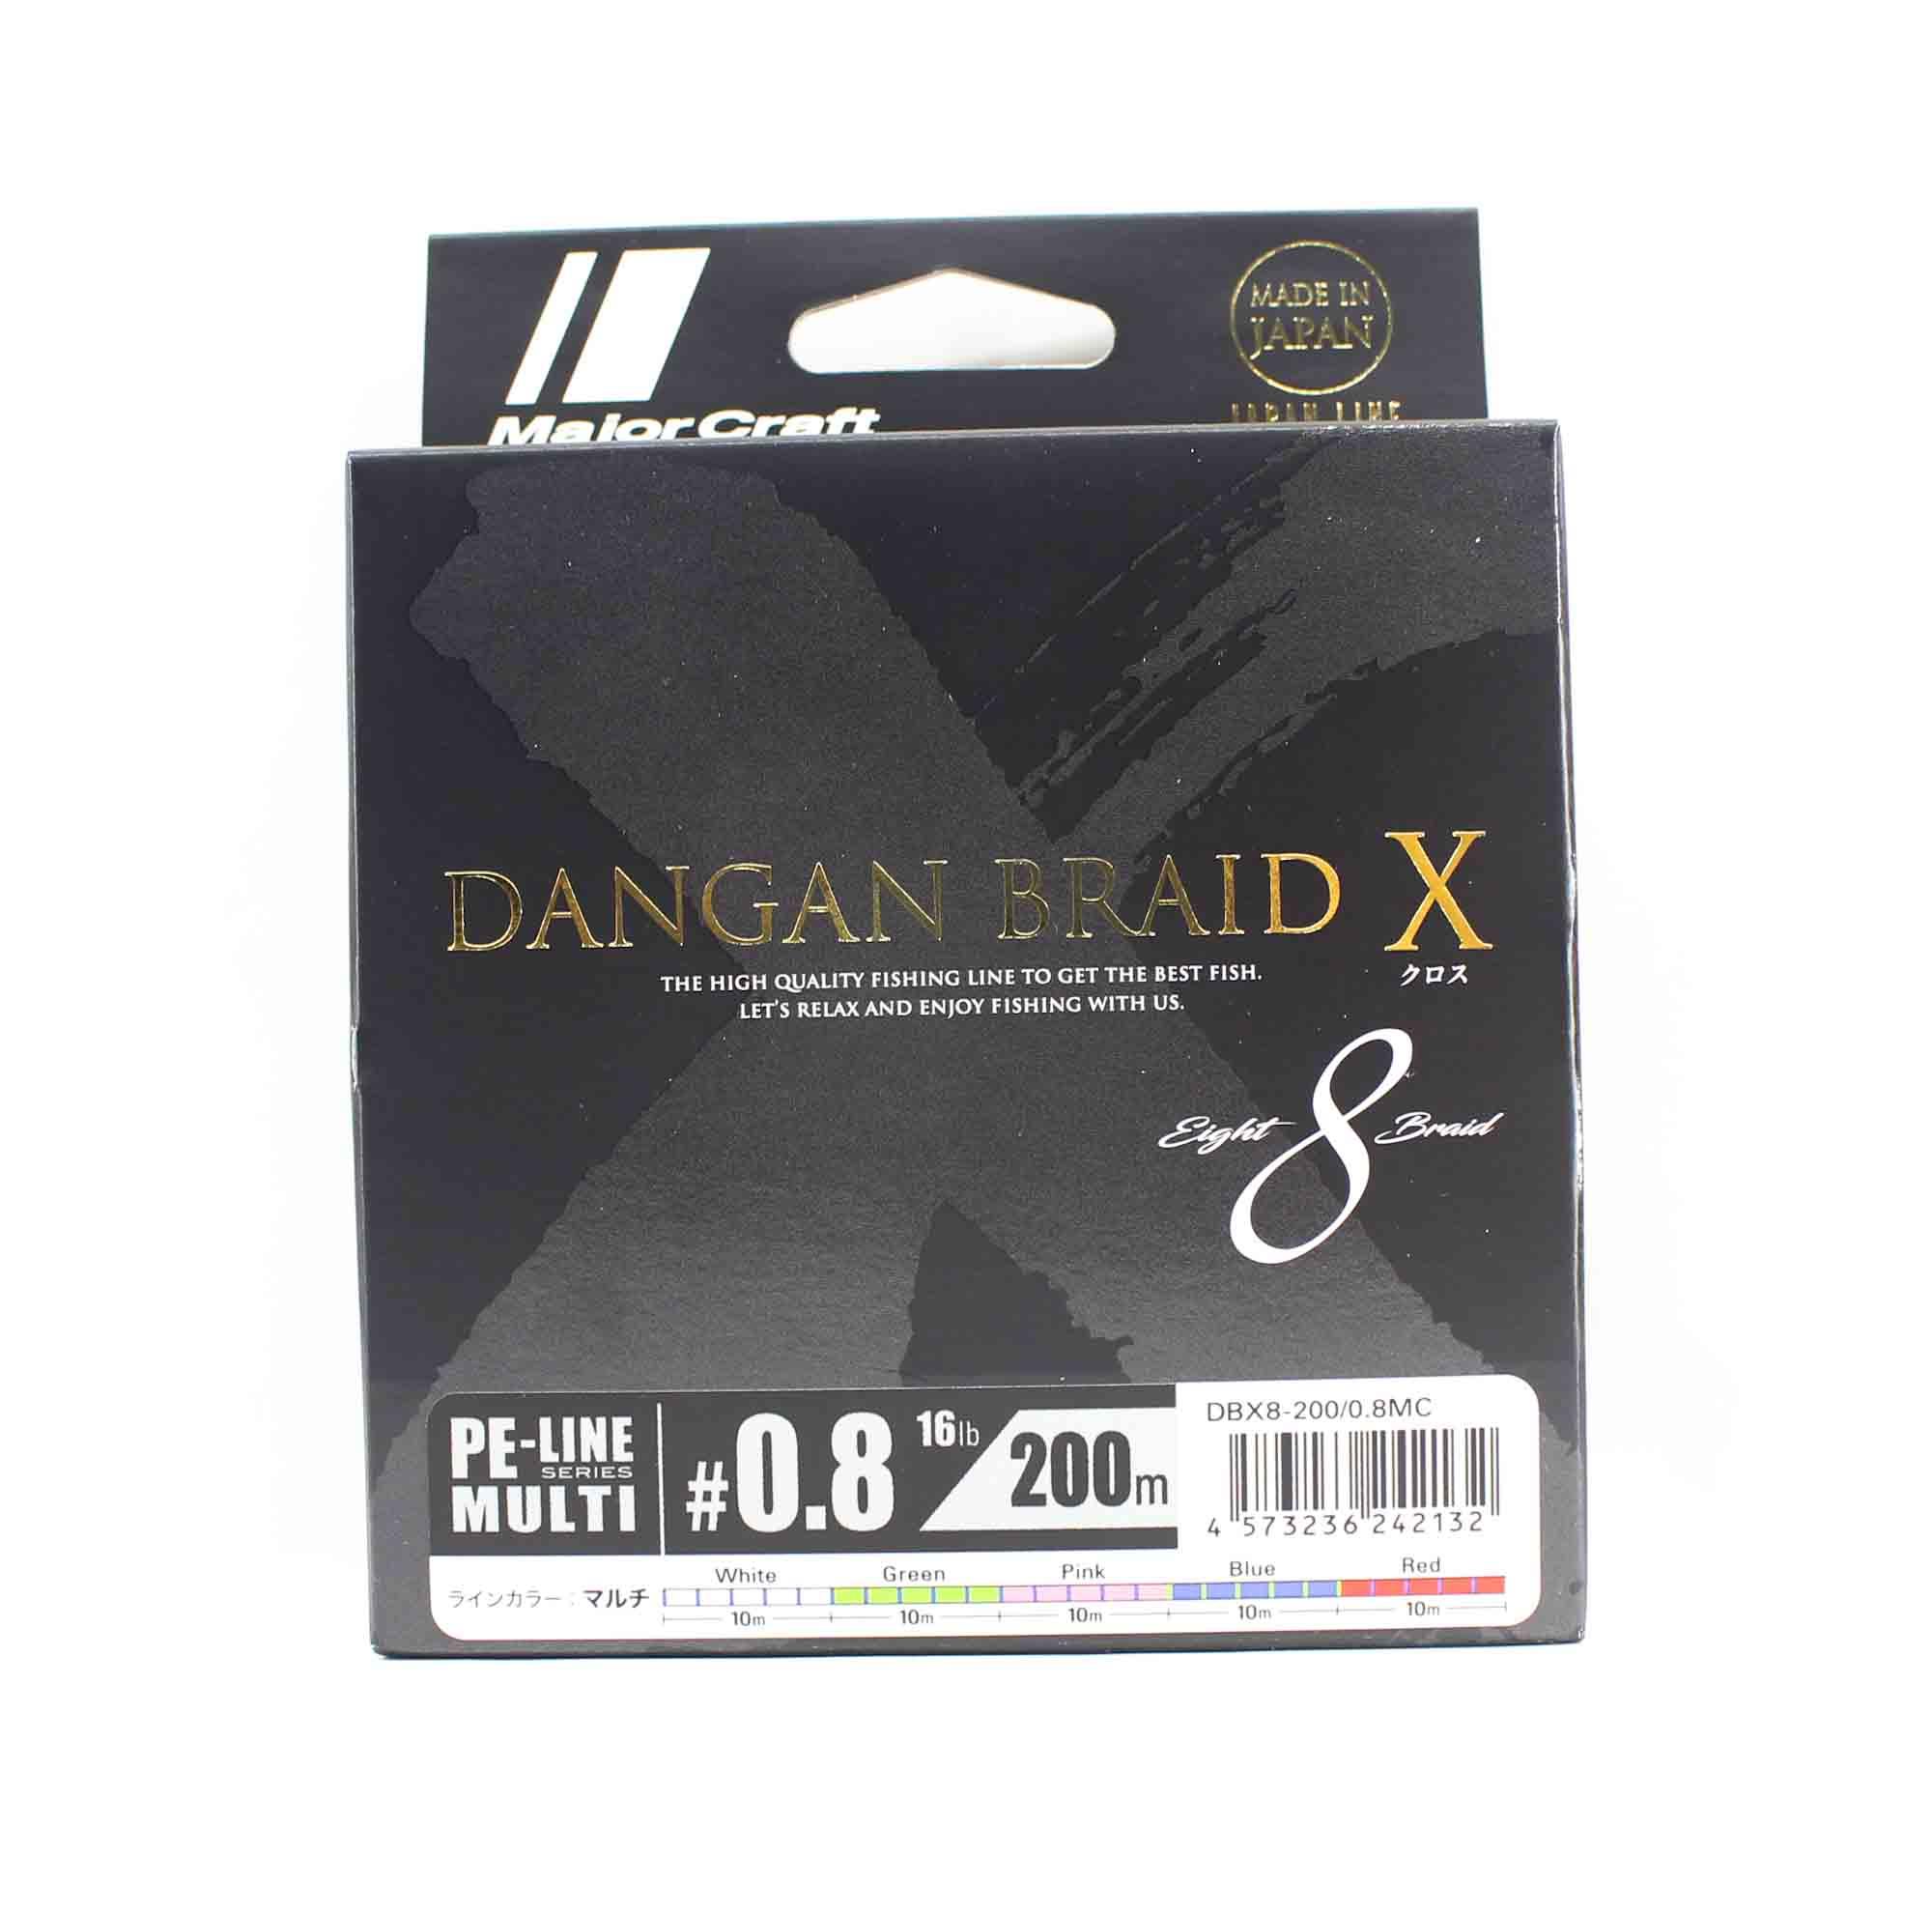 Major Craft Dangan Braid X Line X8 200m P.E 0.8 Multi DBX8-200/0.8MC (2132)